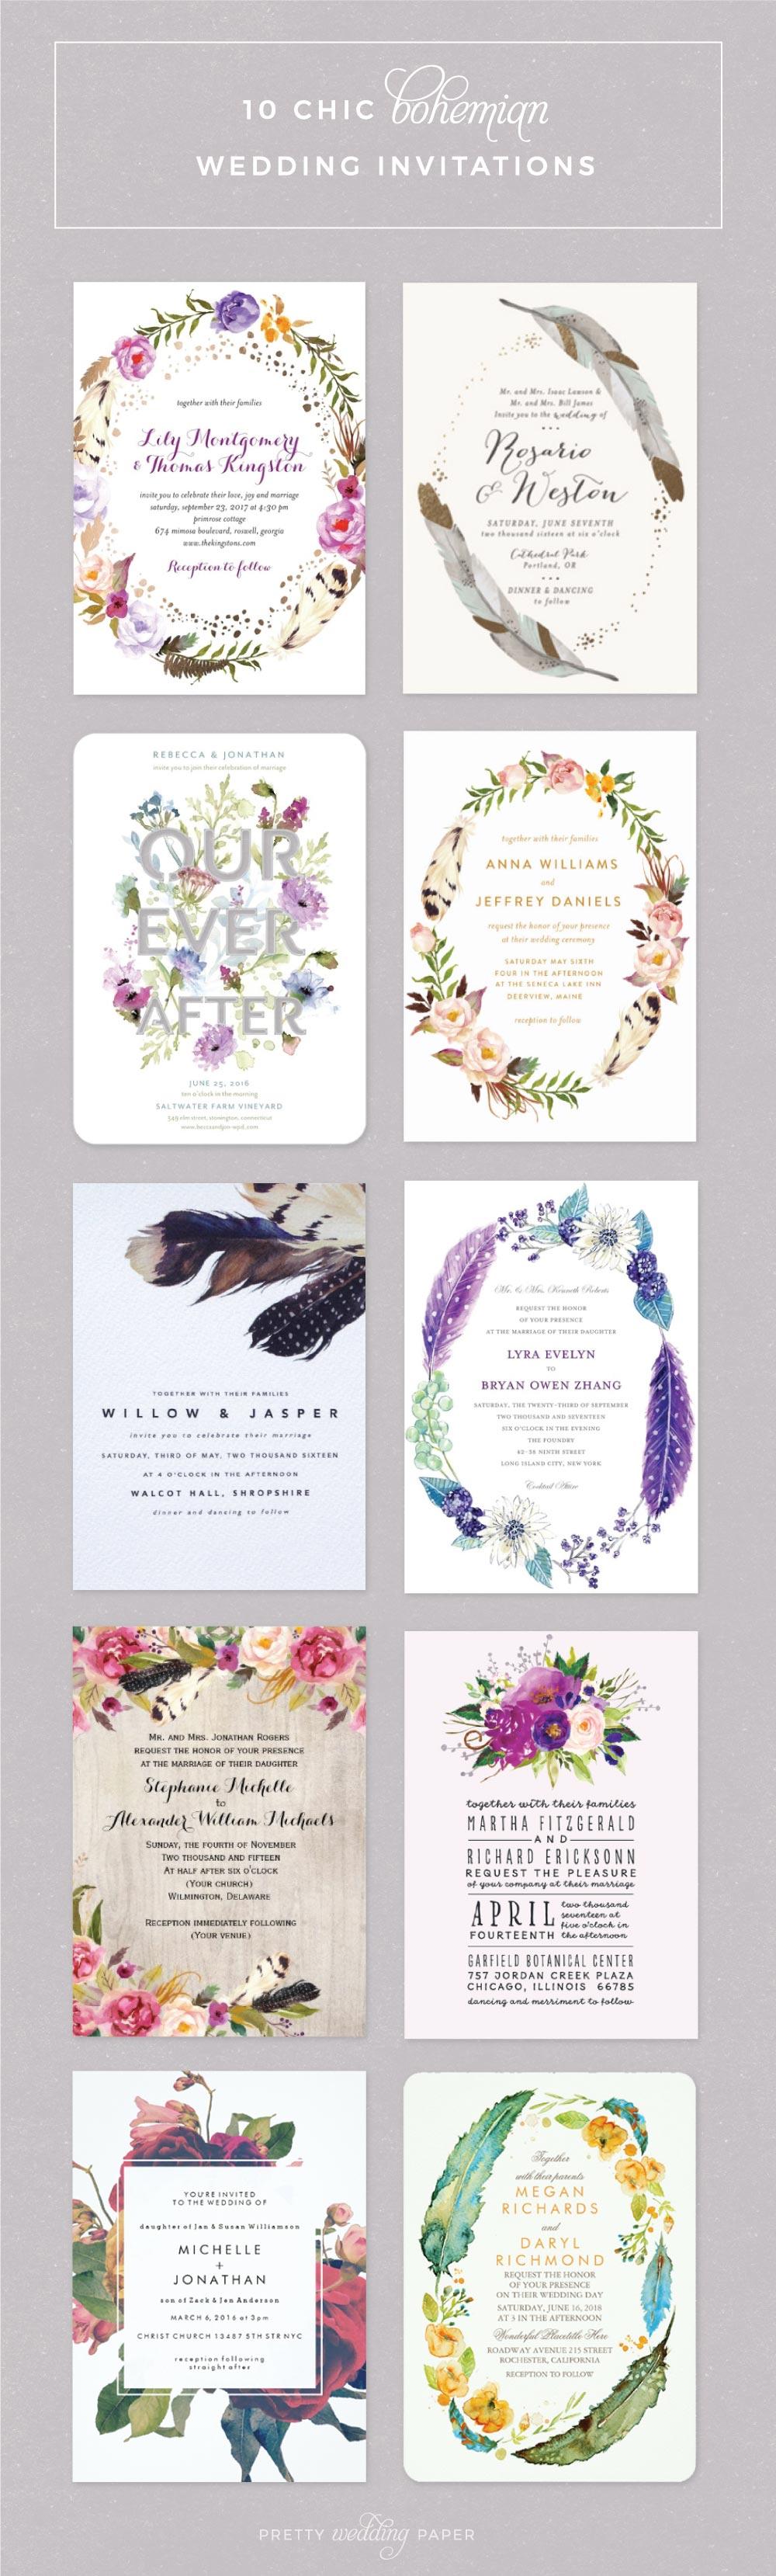 085bf4dbd9e3 Top 10 Boho Wedding Invitations  Pretty Florals + Feathers